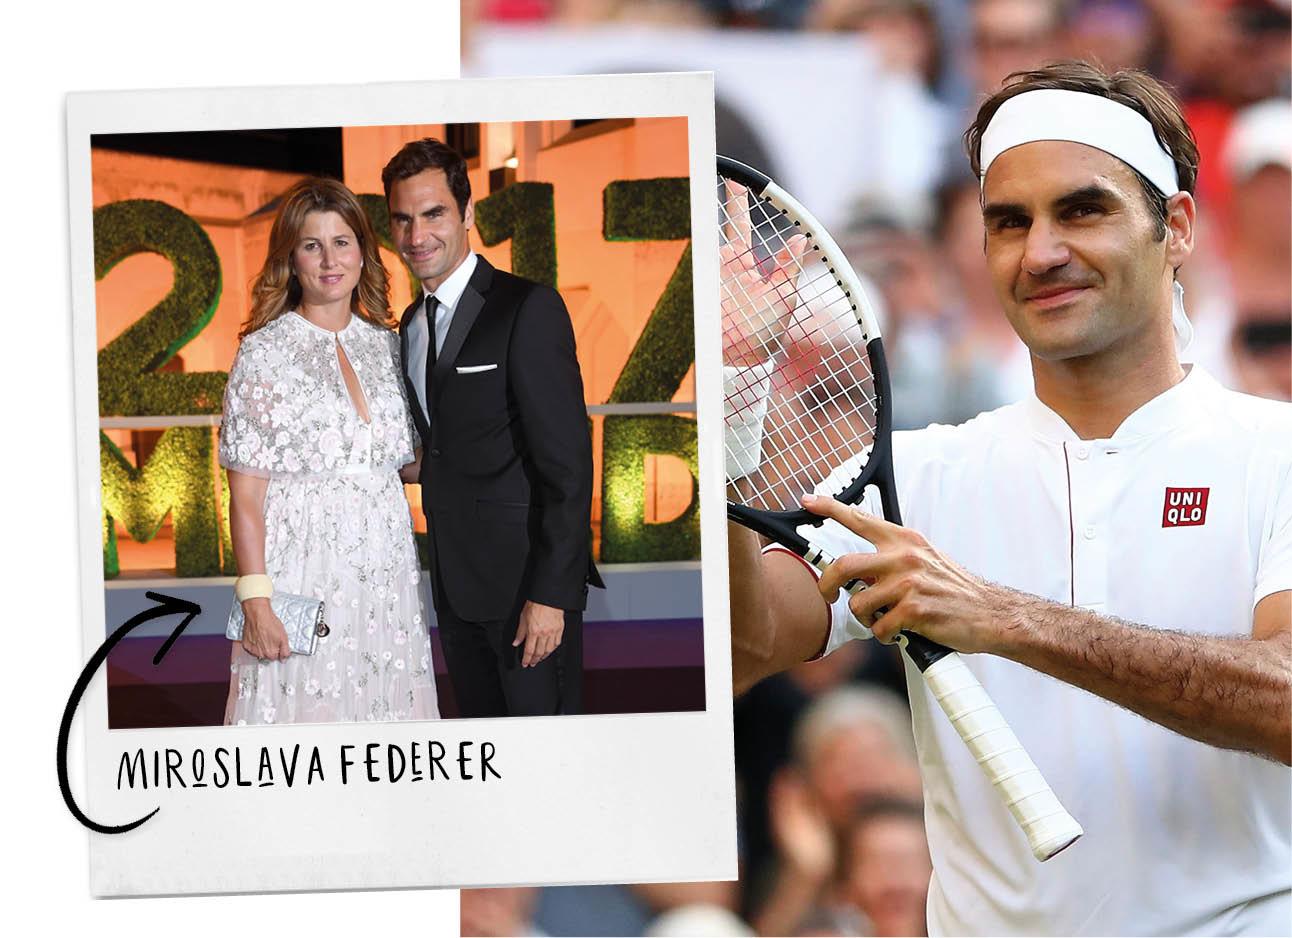 Miroslava Federer-Roger-May-tennis-wedstrijd